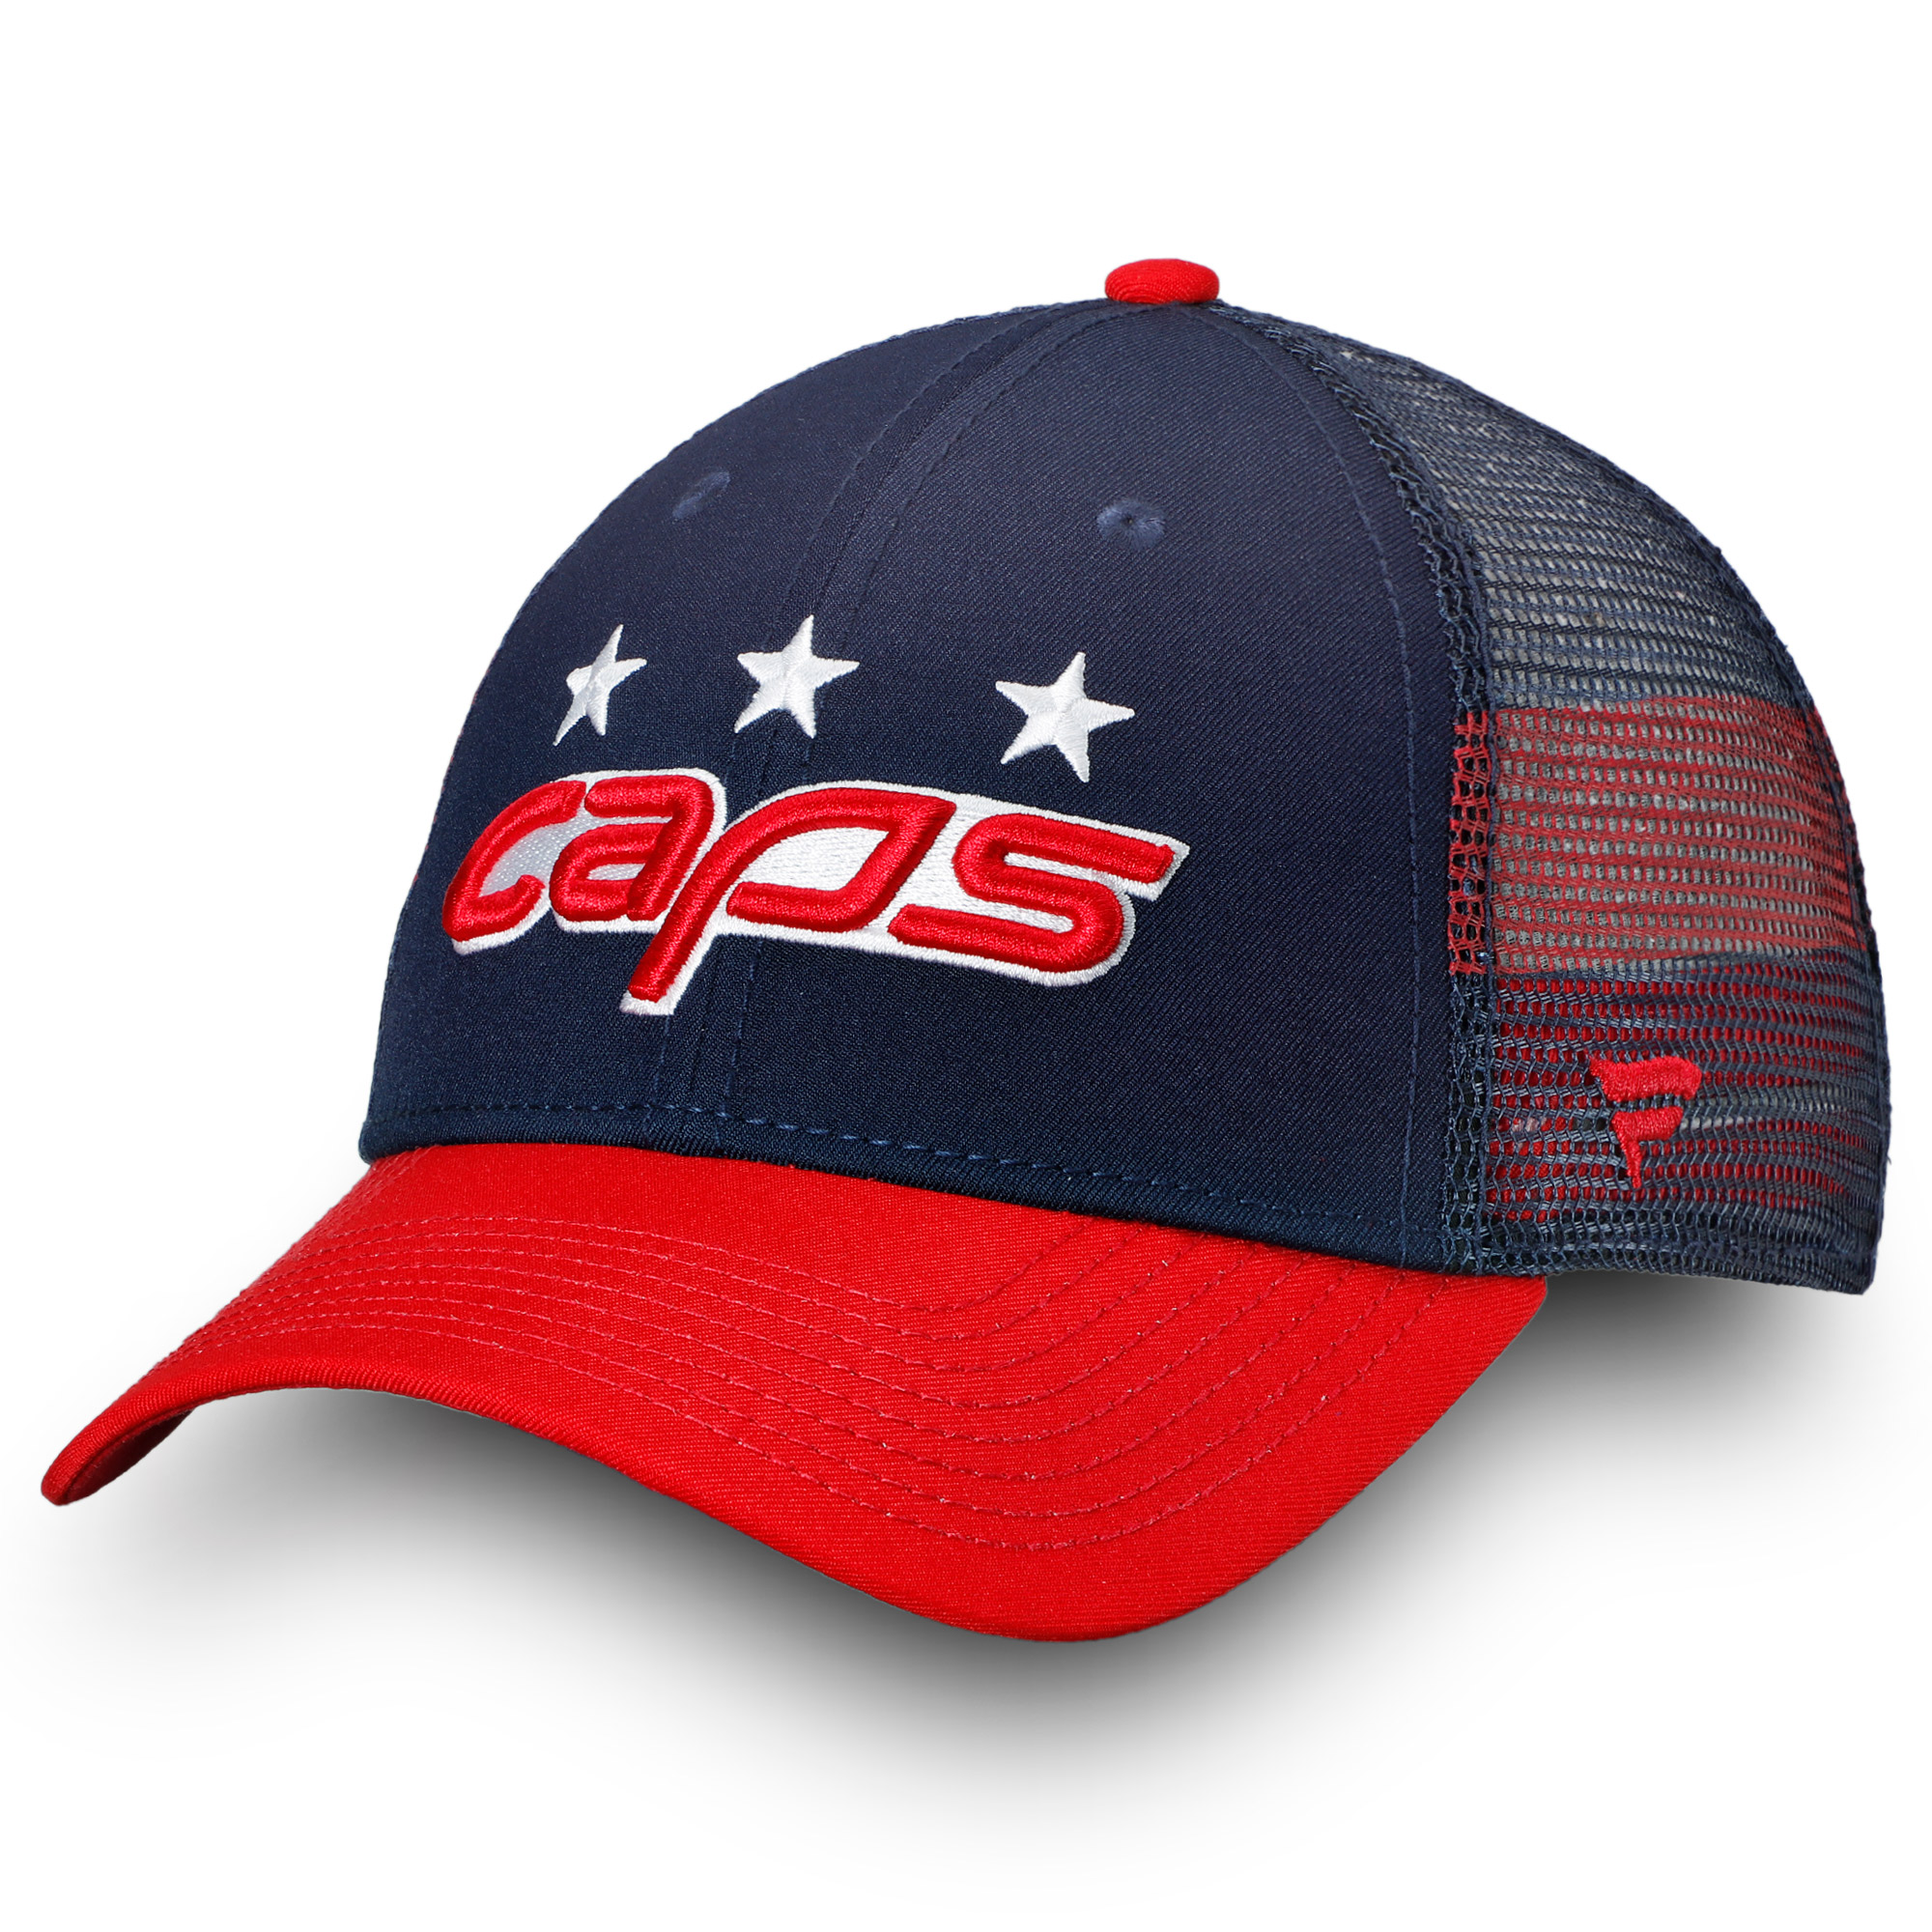 Men s Fanatics Branded Navy Red Washington Capitals 2018 Stadium Series  Trucker Adjustable Hat - OSFA - Walmart.com 1e98b84dff15